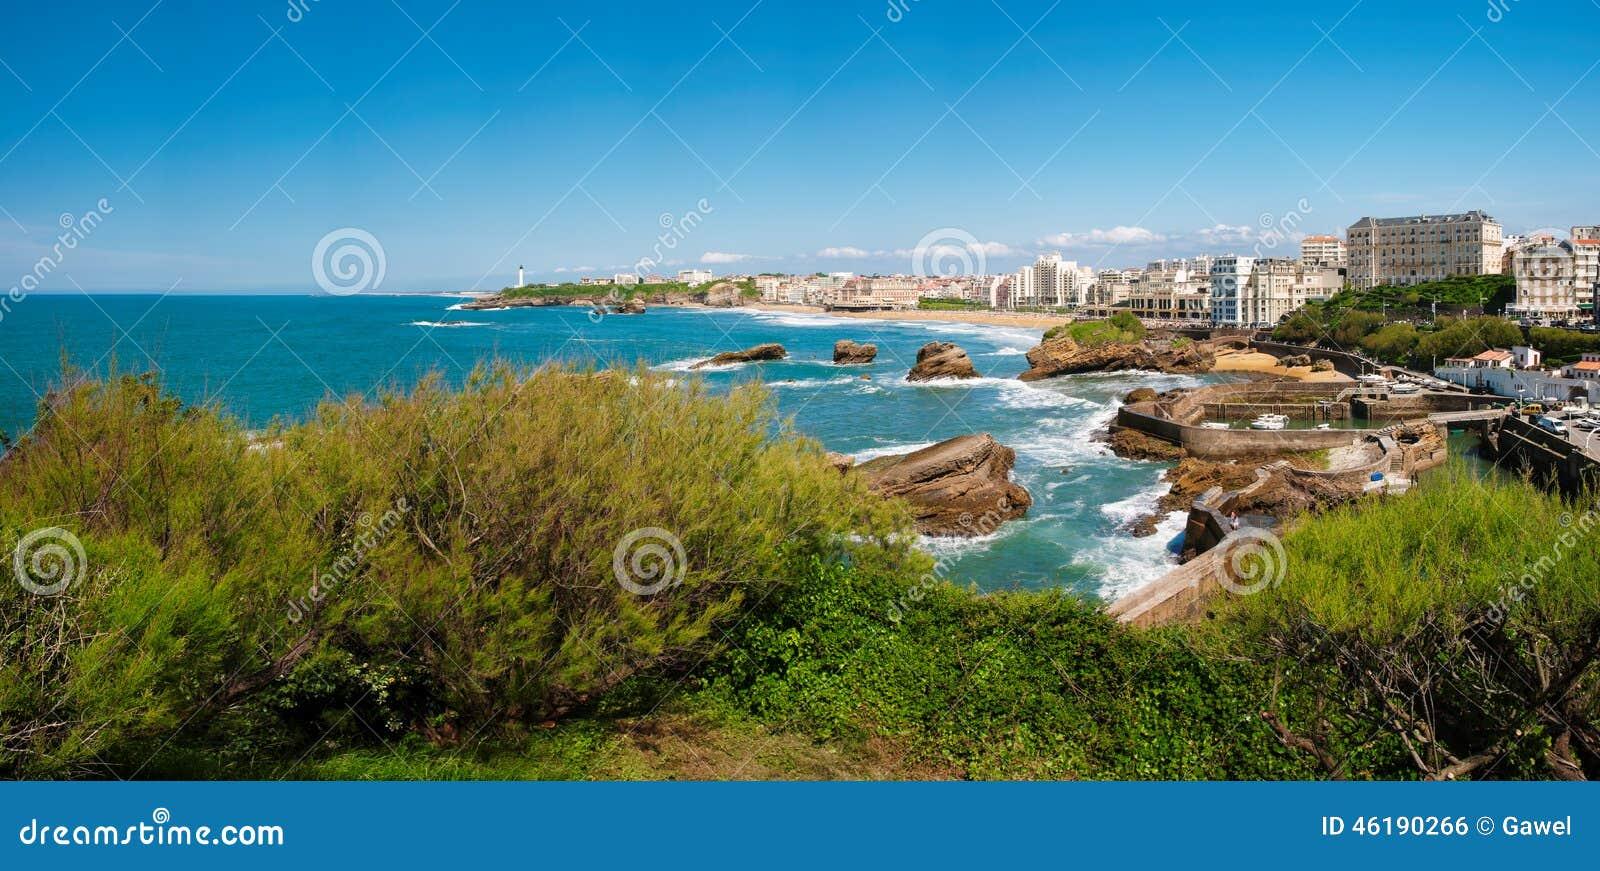 Biarritz, panorama latarnia morska, plaża i miasto, Francja